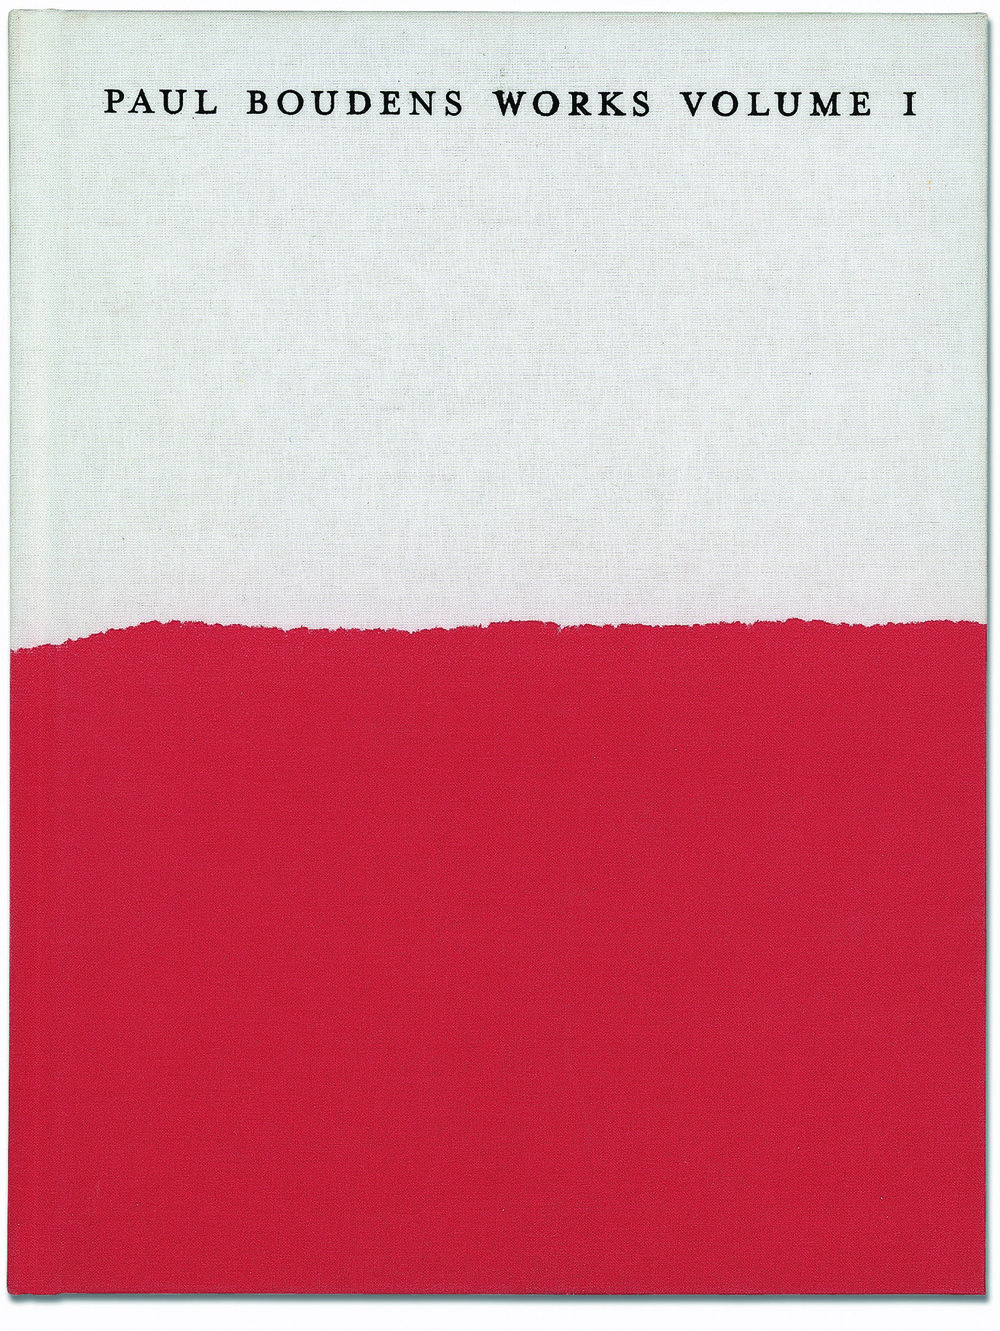 2003 PB Works Volume I.jpg